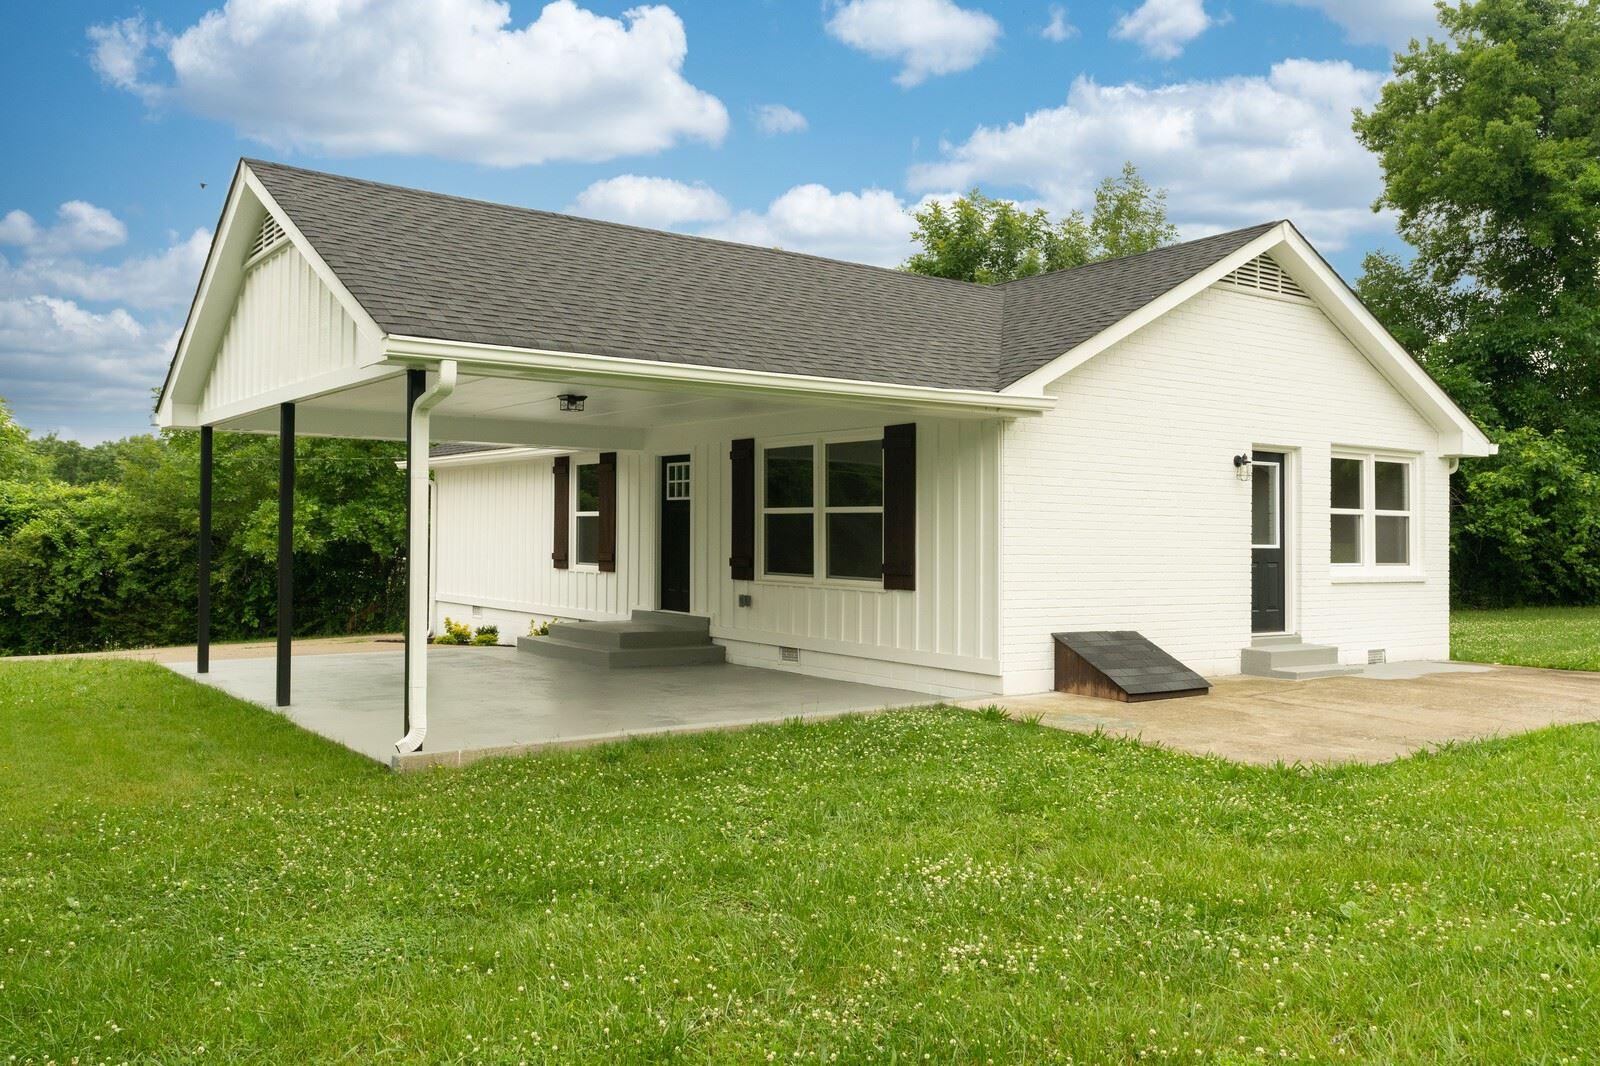 122 Yorkside Pl, Hendersonville, TN 37075 - MLS#: 2262021